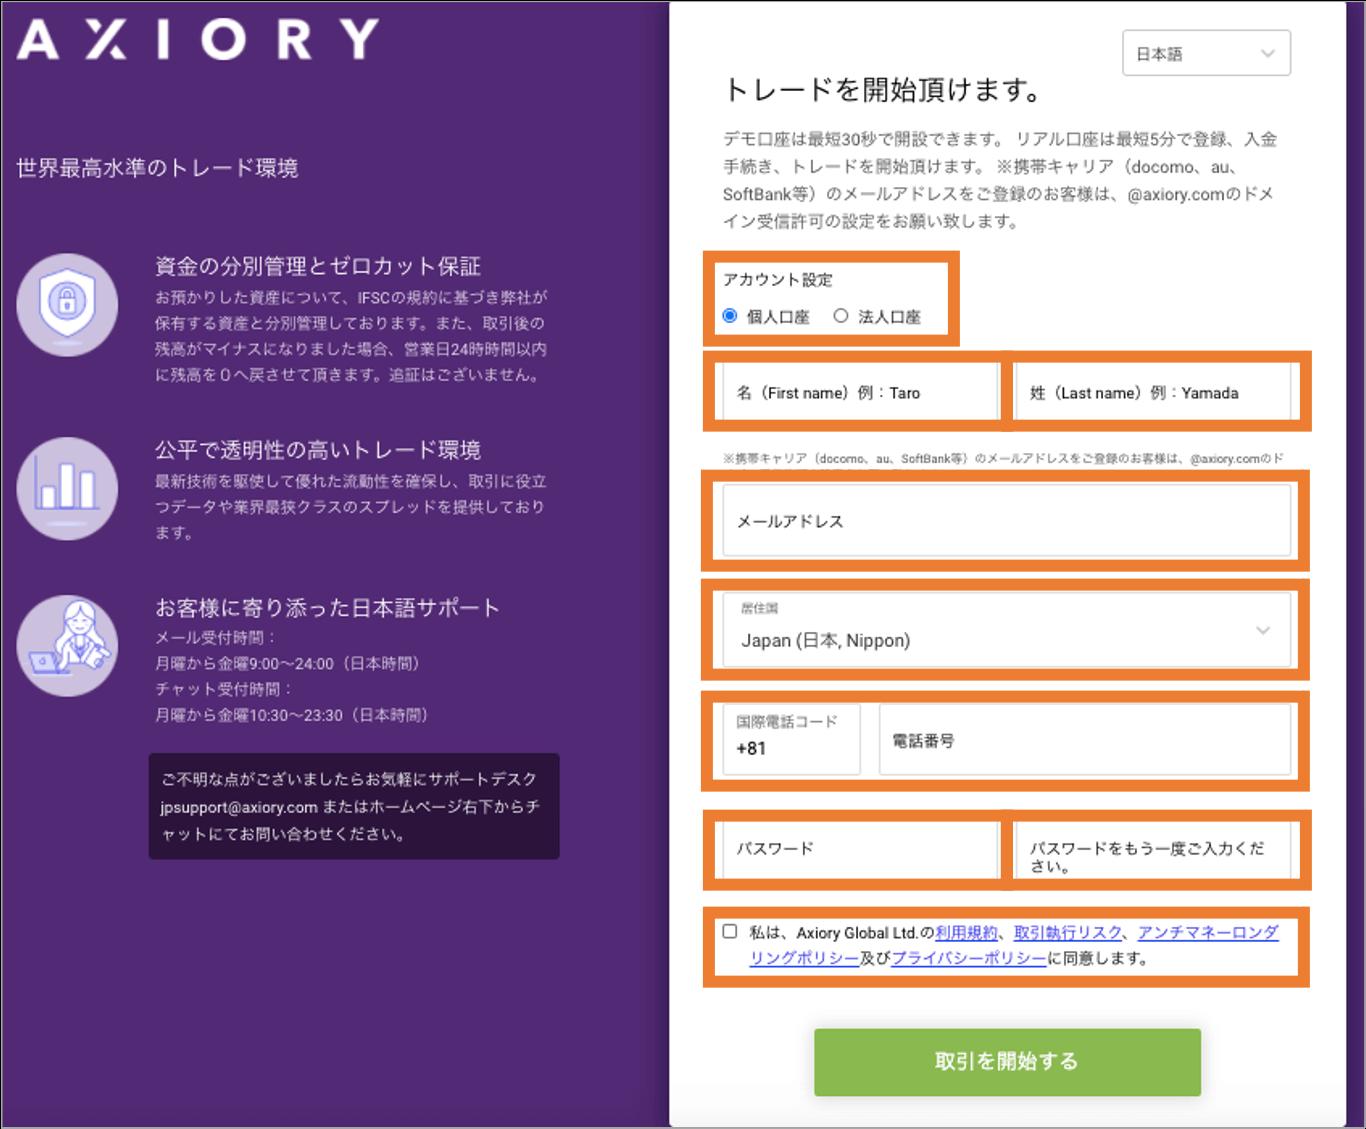 AXIORY口座開設画面画像